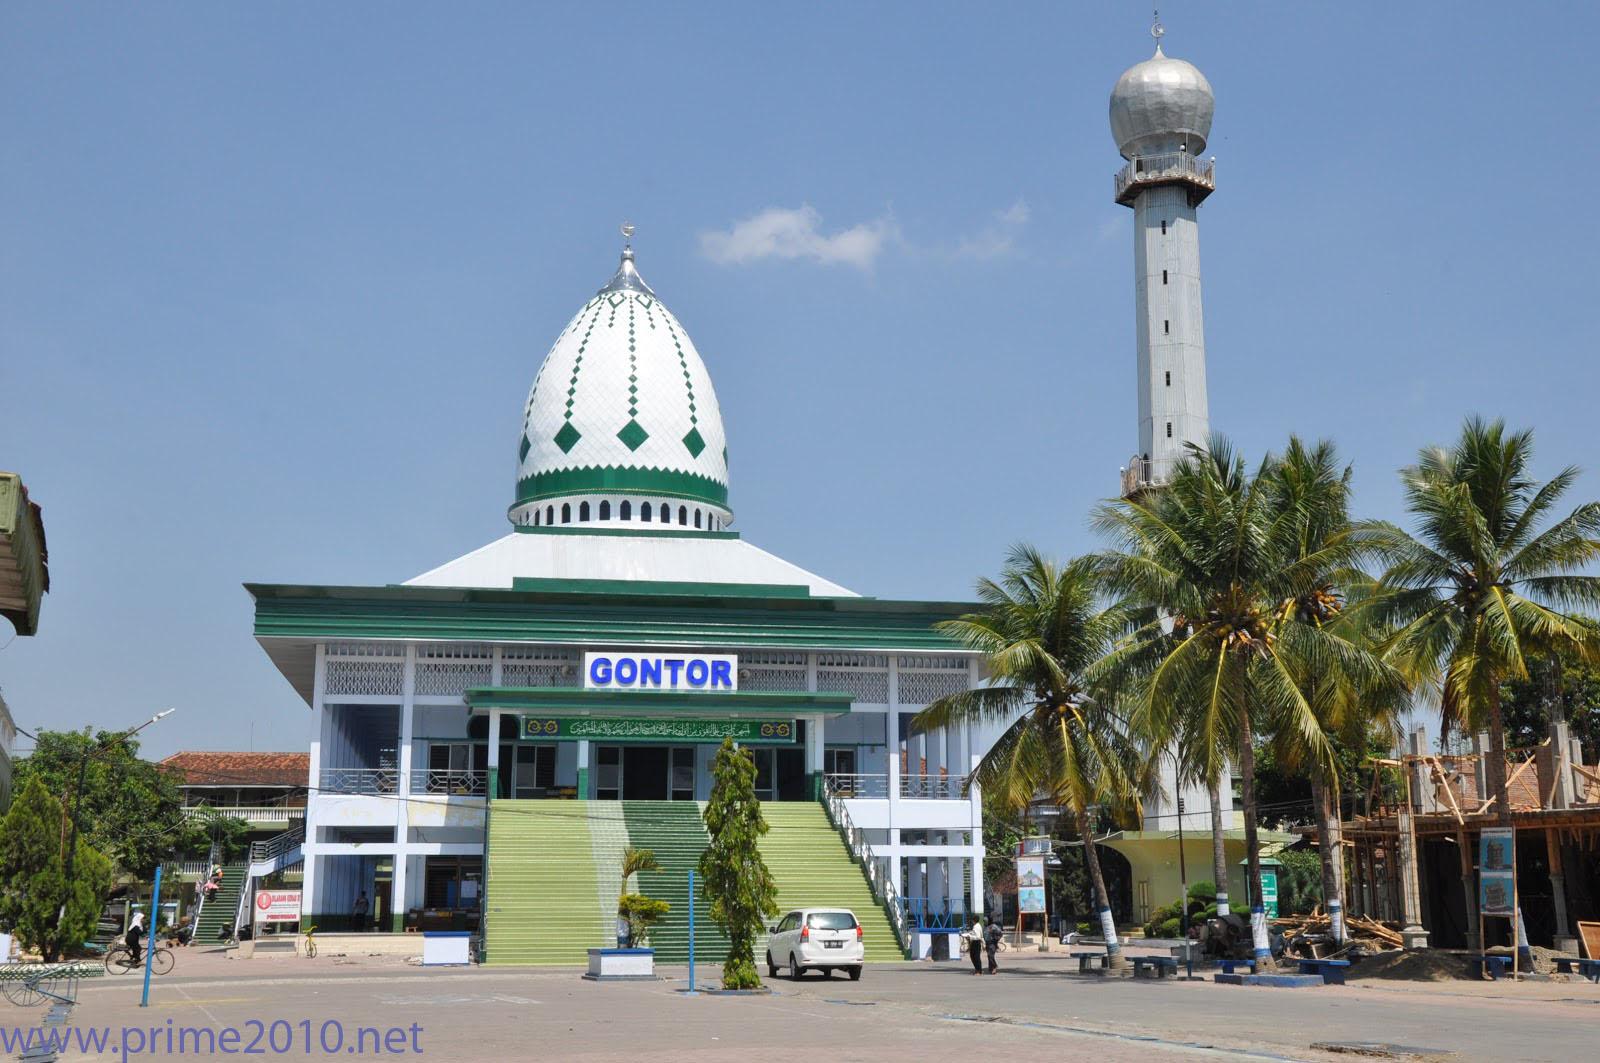 Gontor - ISID Kampus Gontor 1 | Berita | Mahasiswa | Islam | Gontor ...